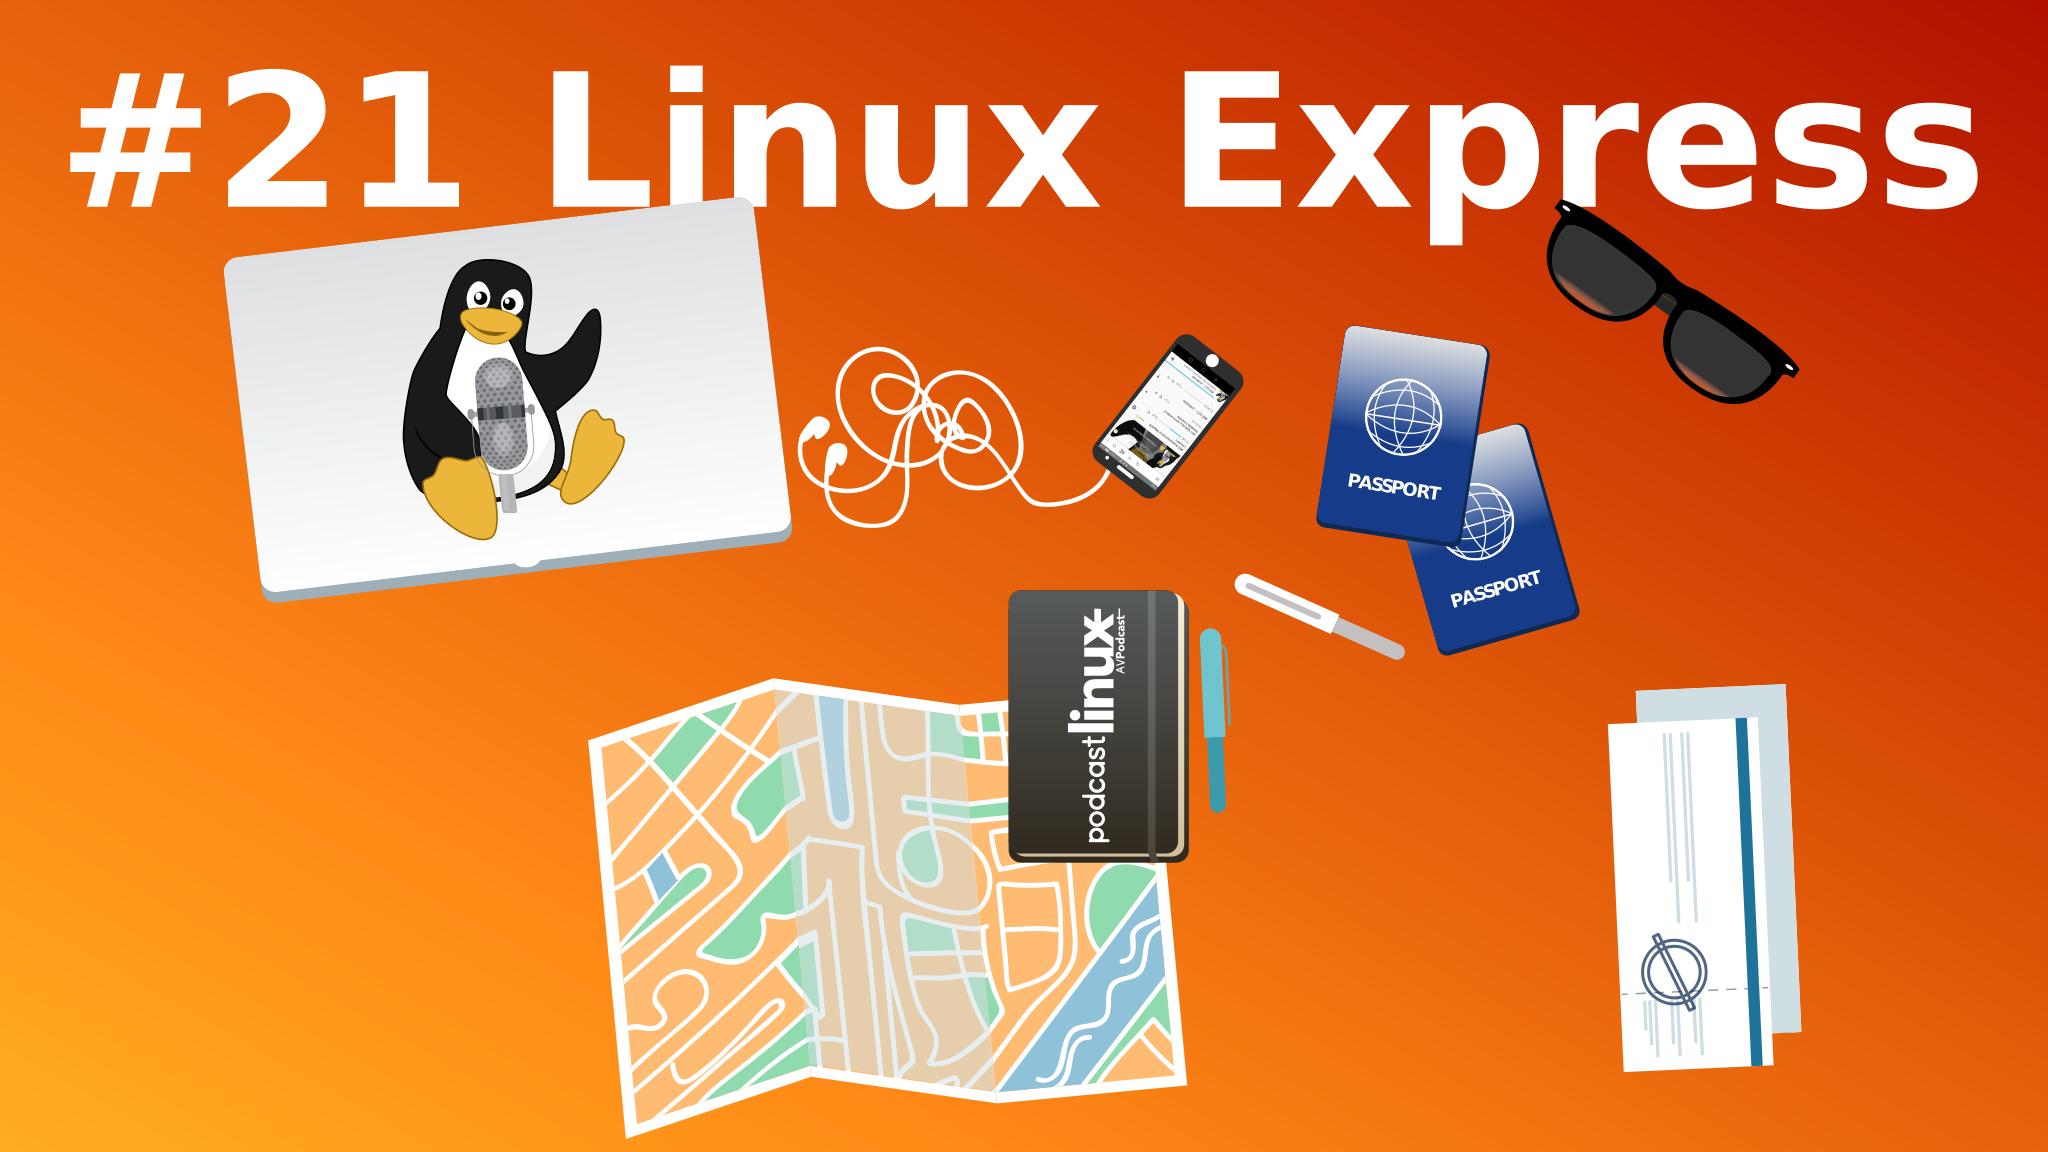 #21 Linux Express